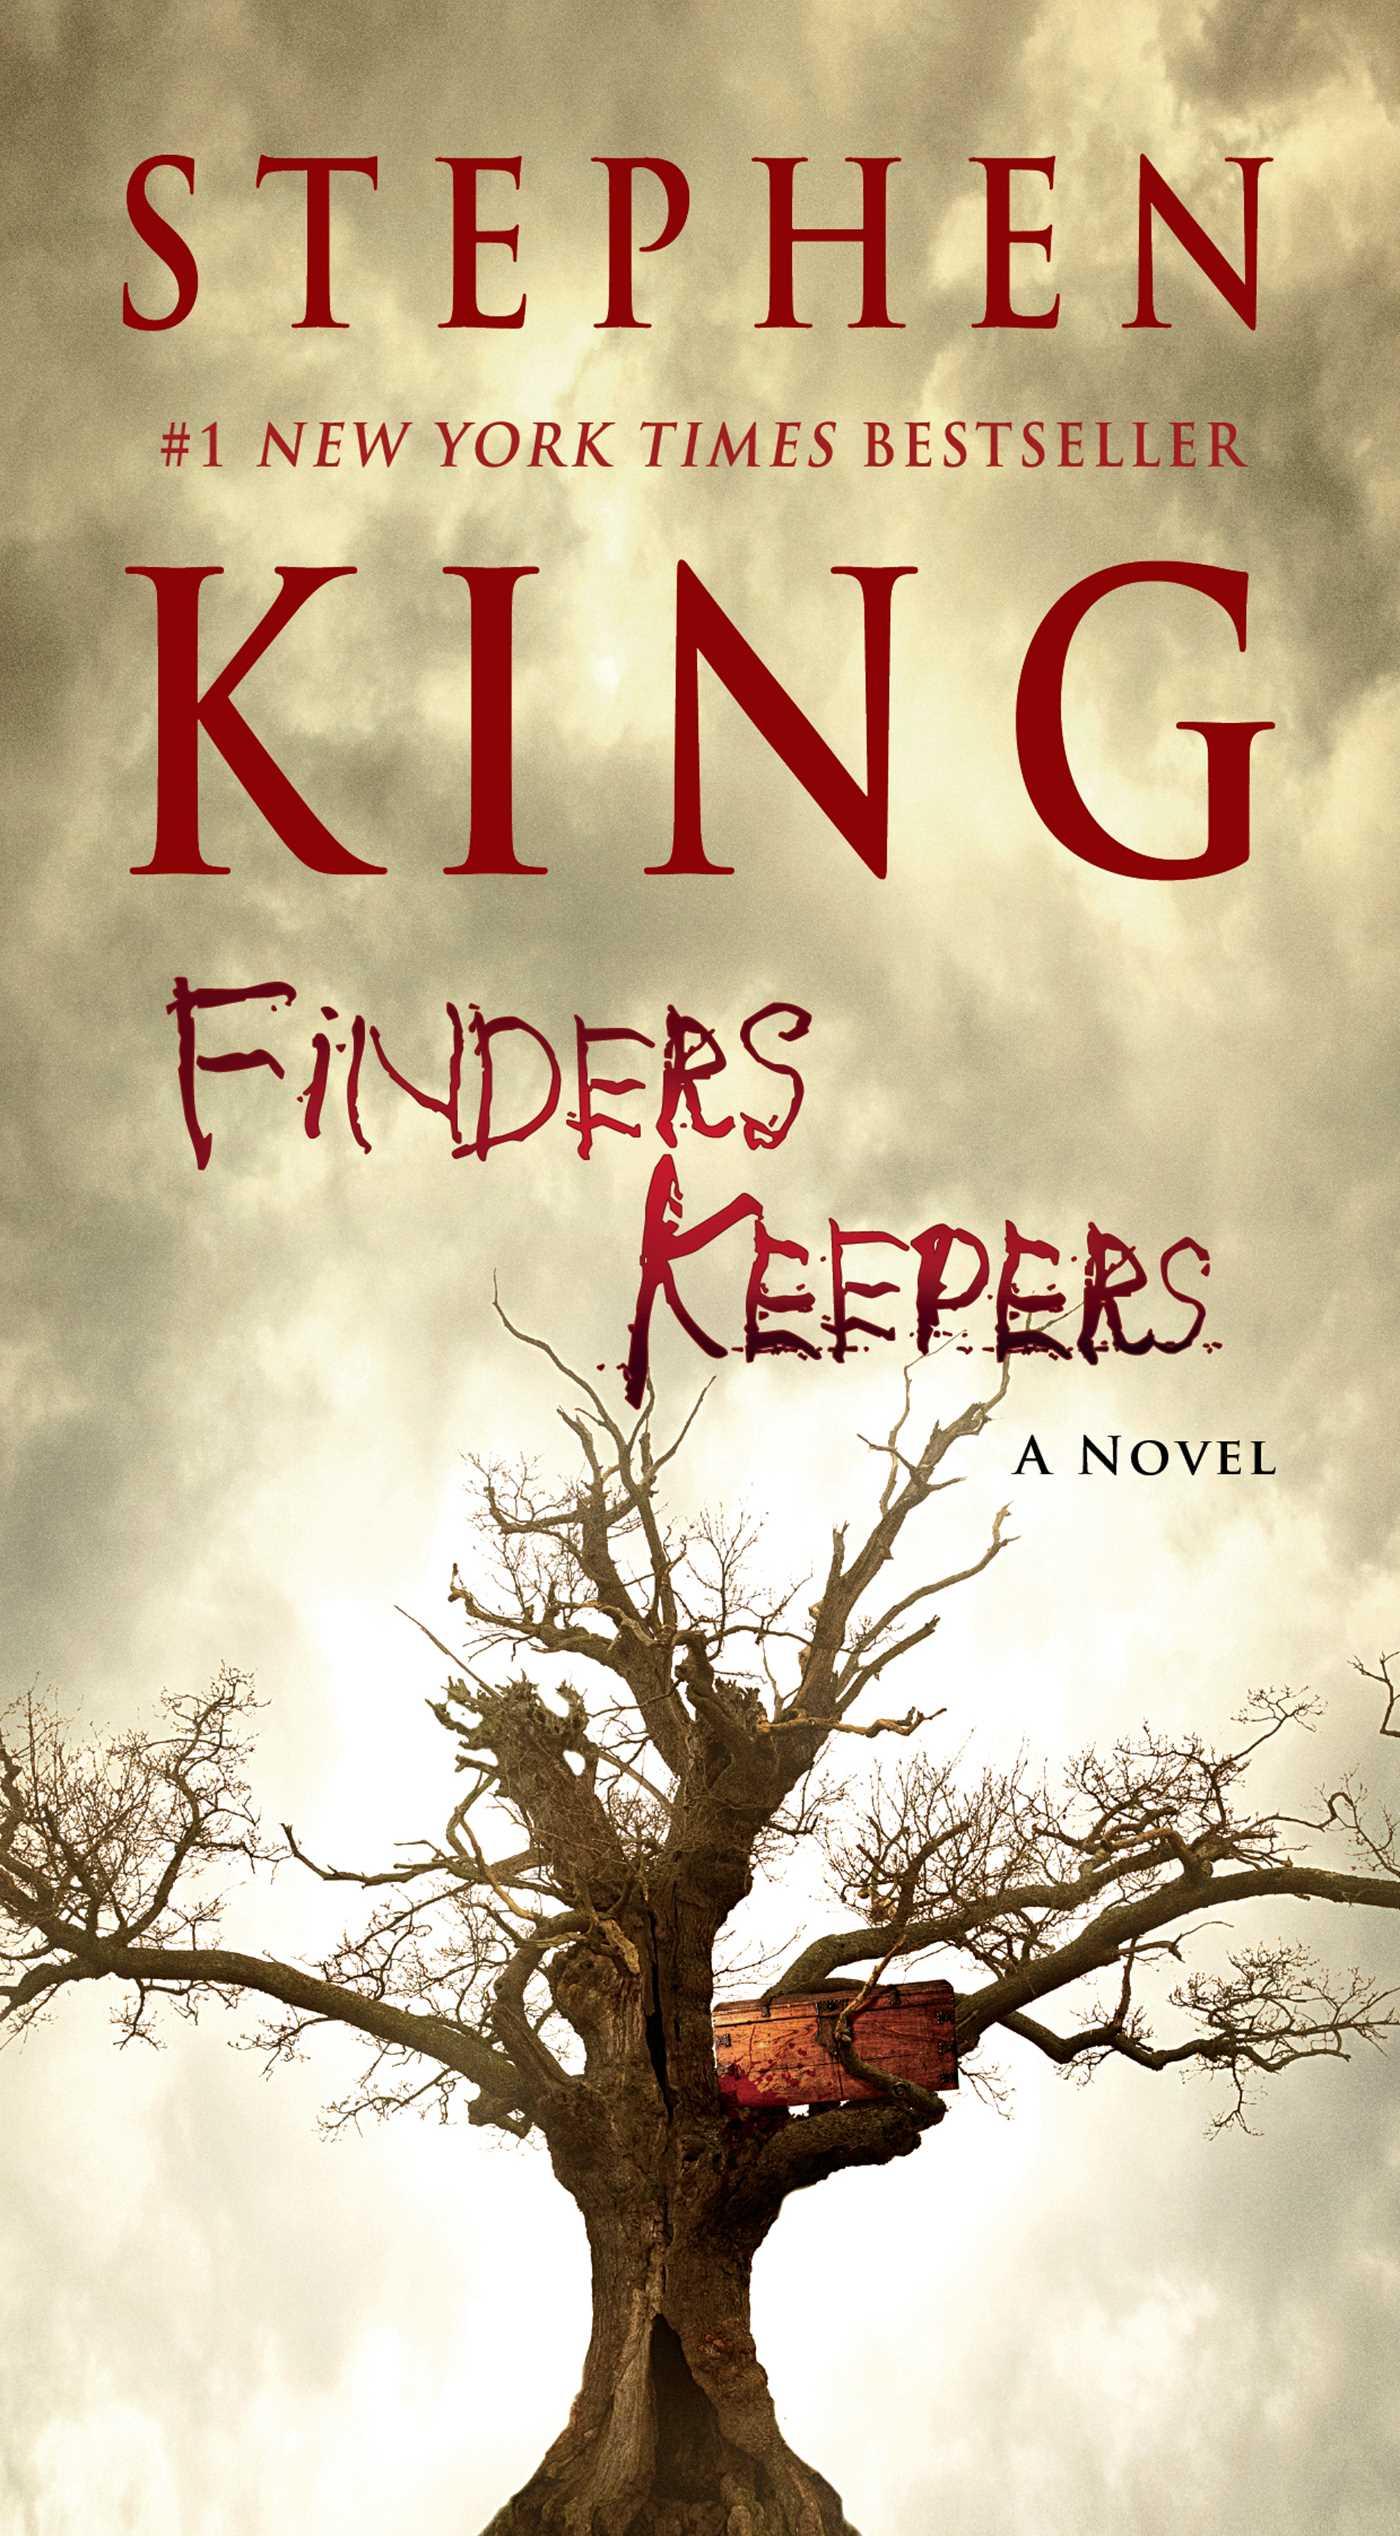 Finders keepers 9781501100123 hr